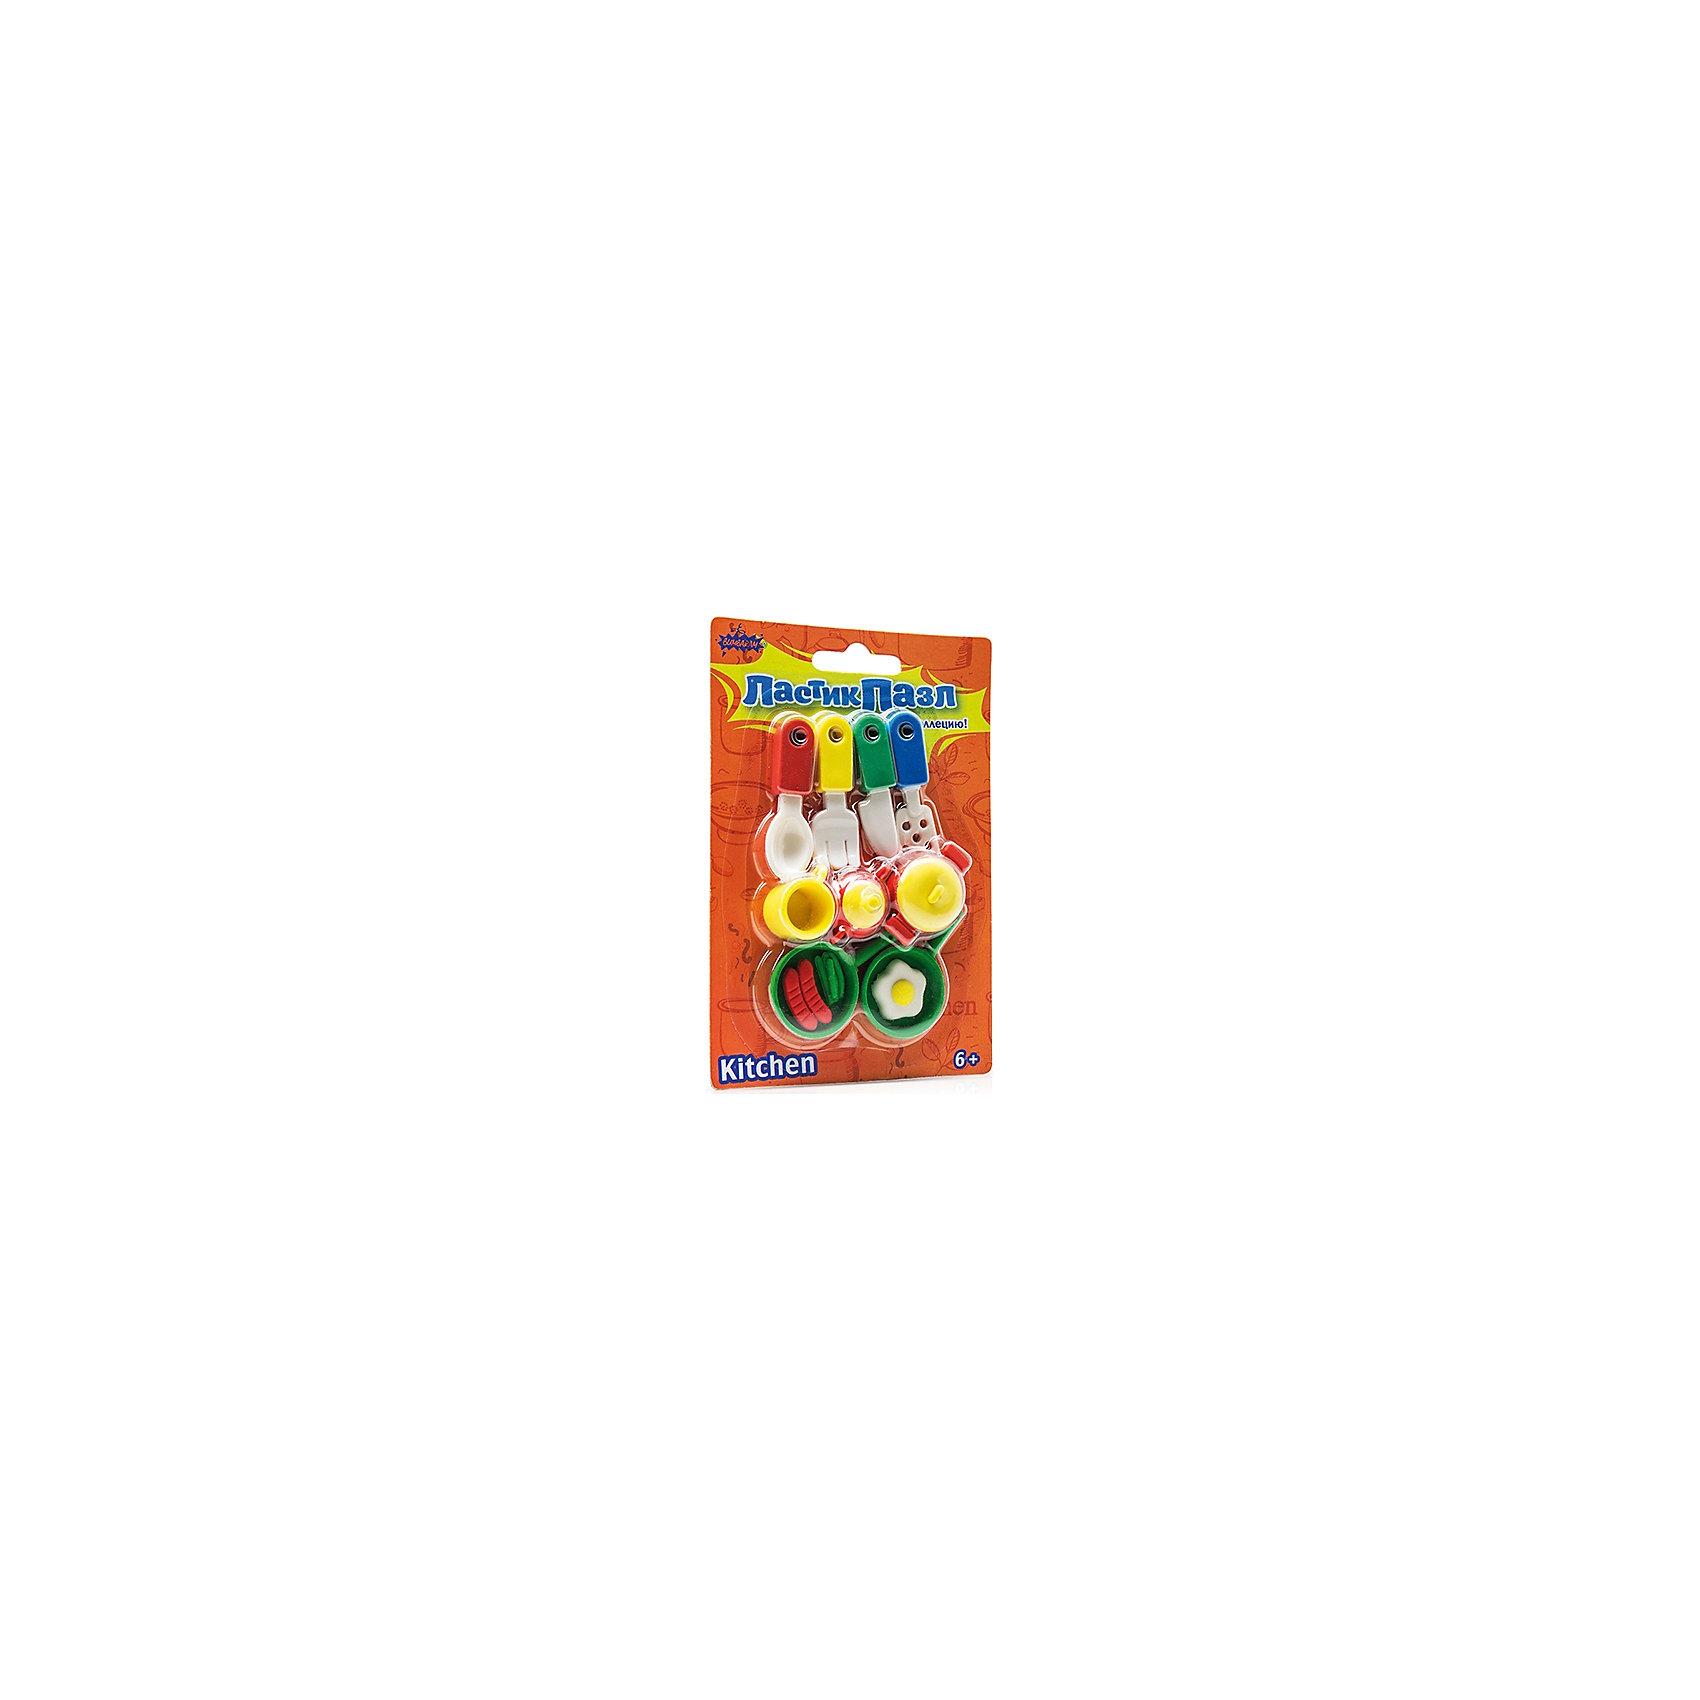 Бумбарам Набор Ластик-Пазл - Кухня Бумбарам бумбарам набор для творчества копилка раскраска сова бумбарам